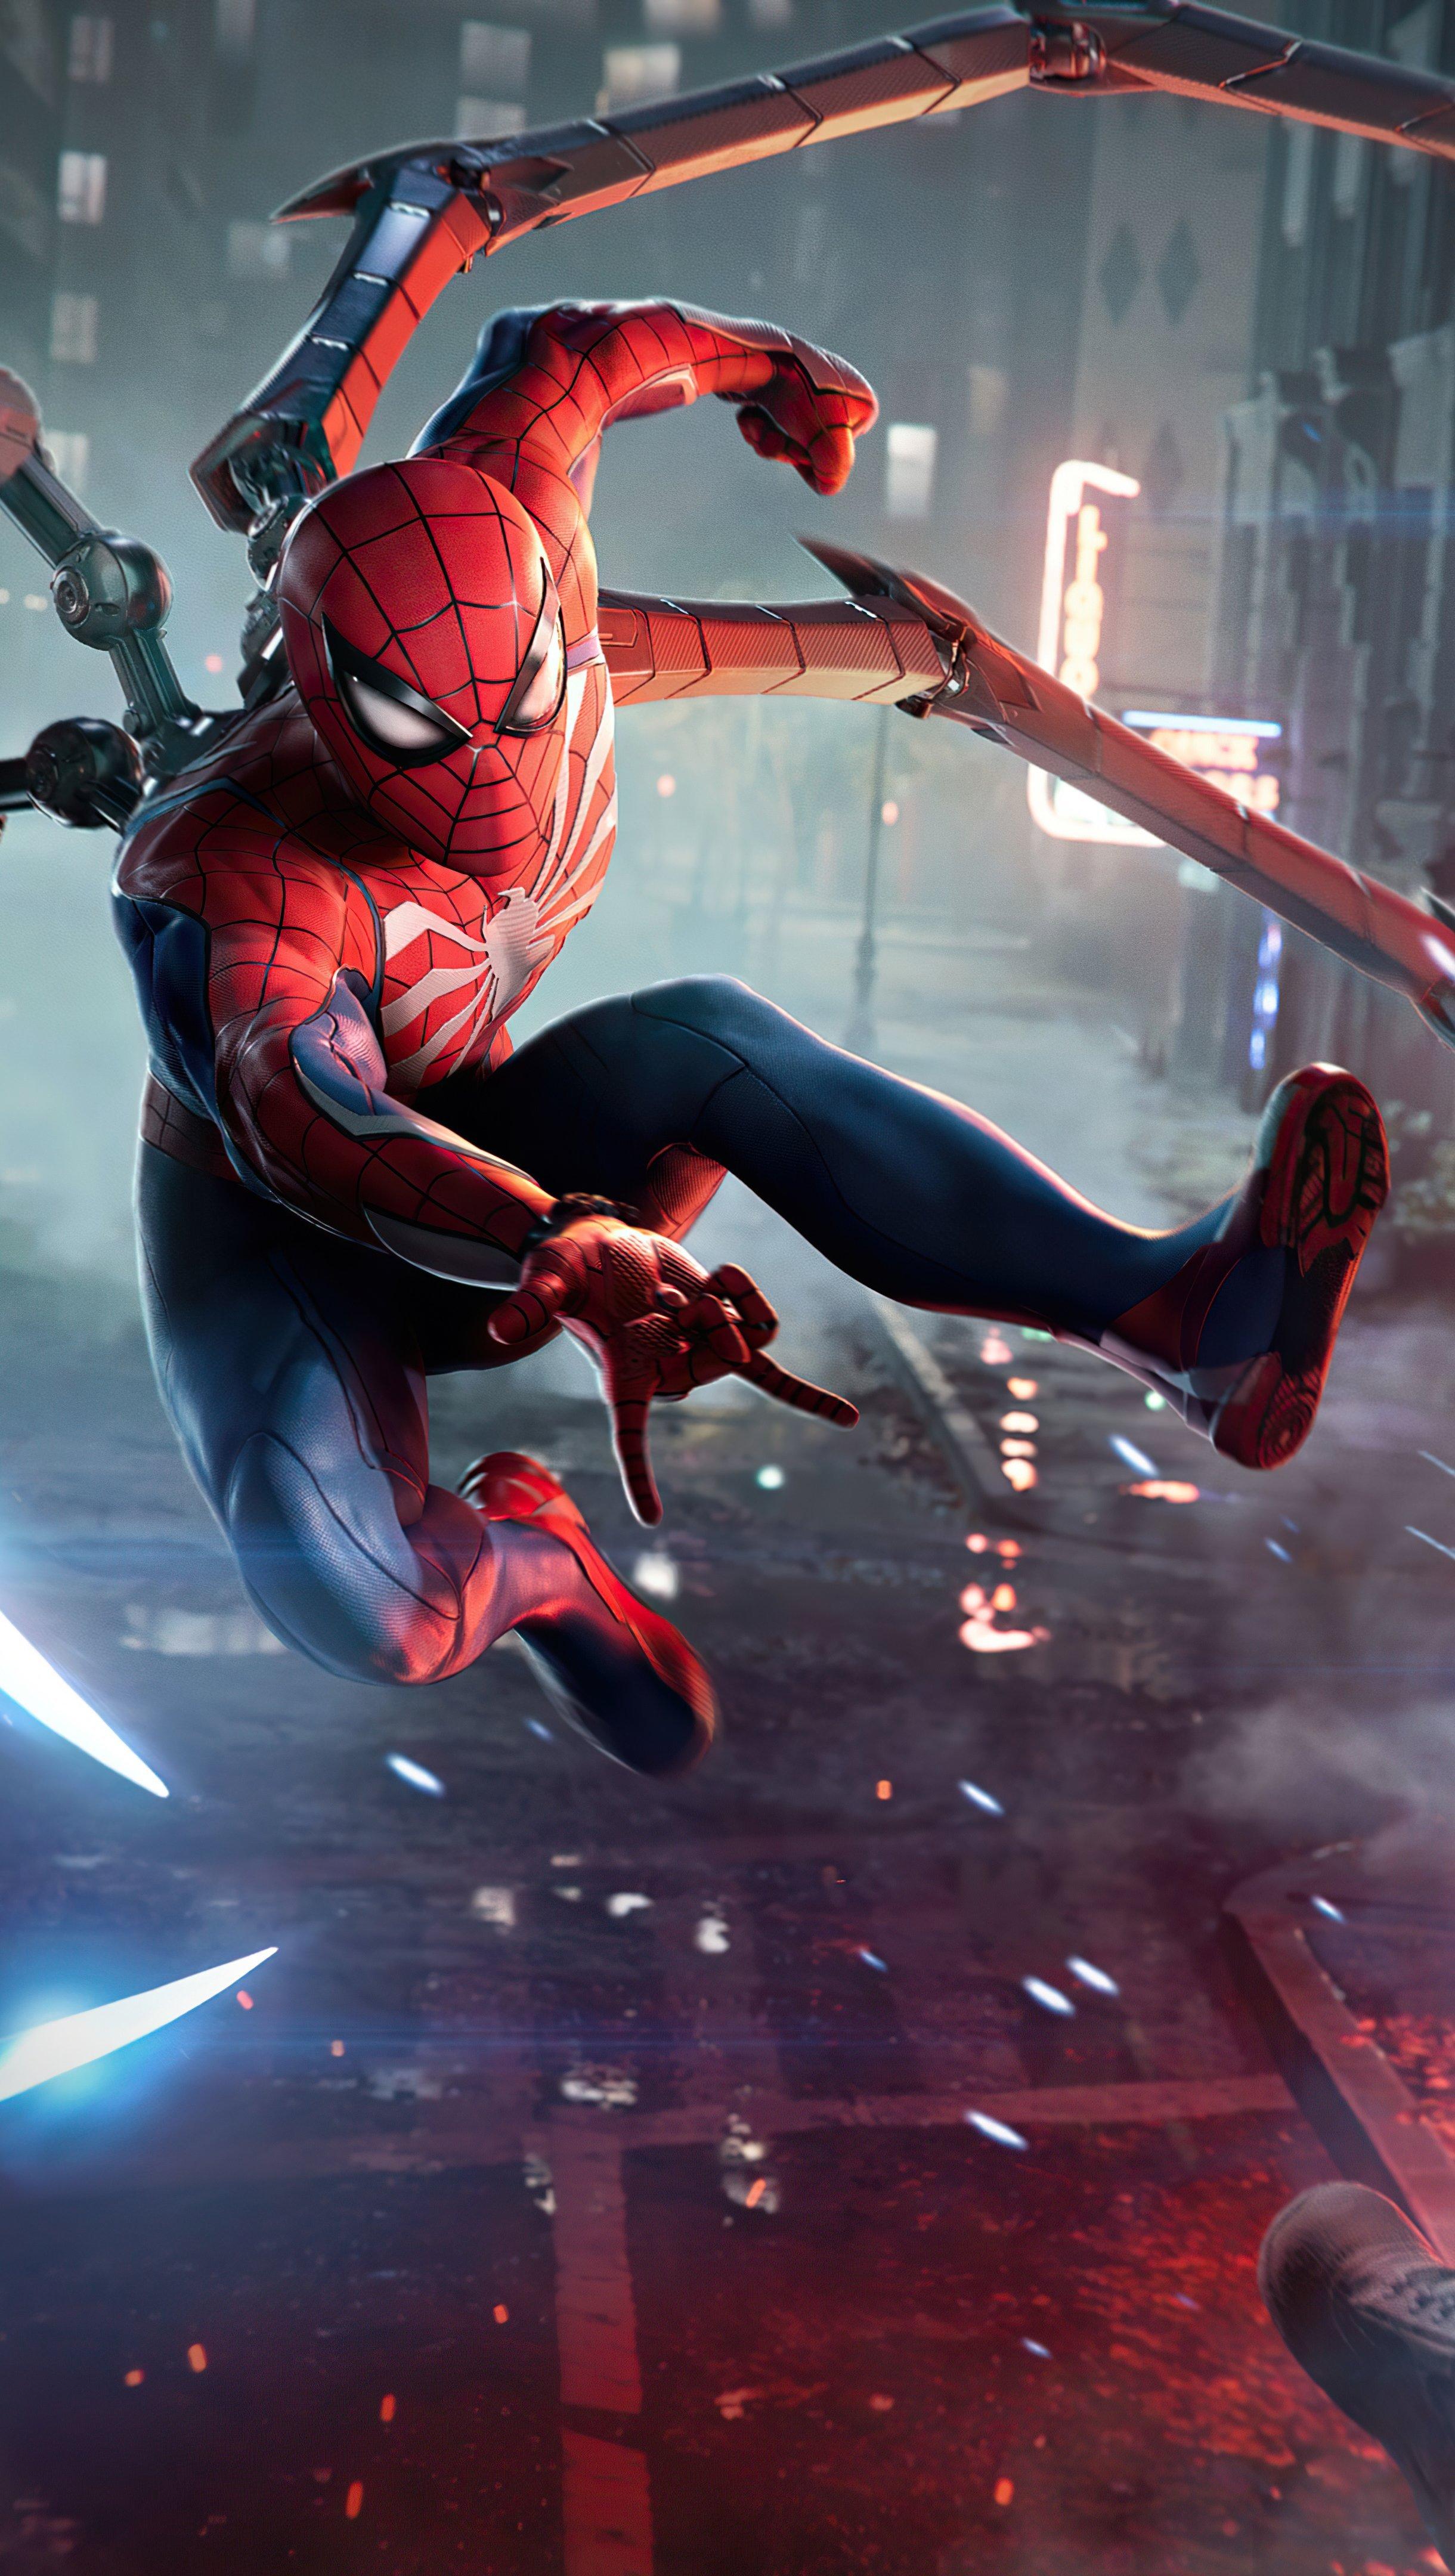 Fondos de pantalla El hombre araña en pelea Vertical